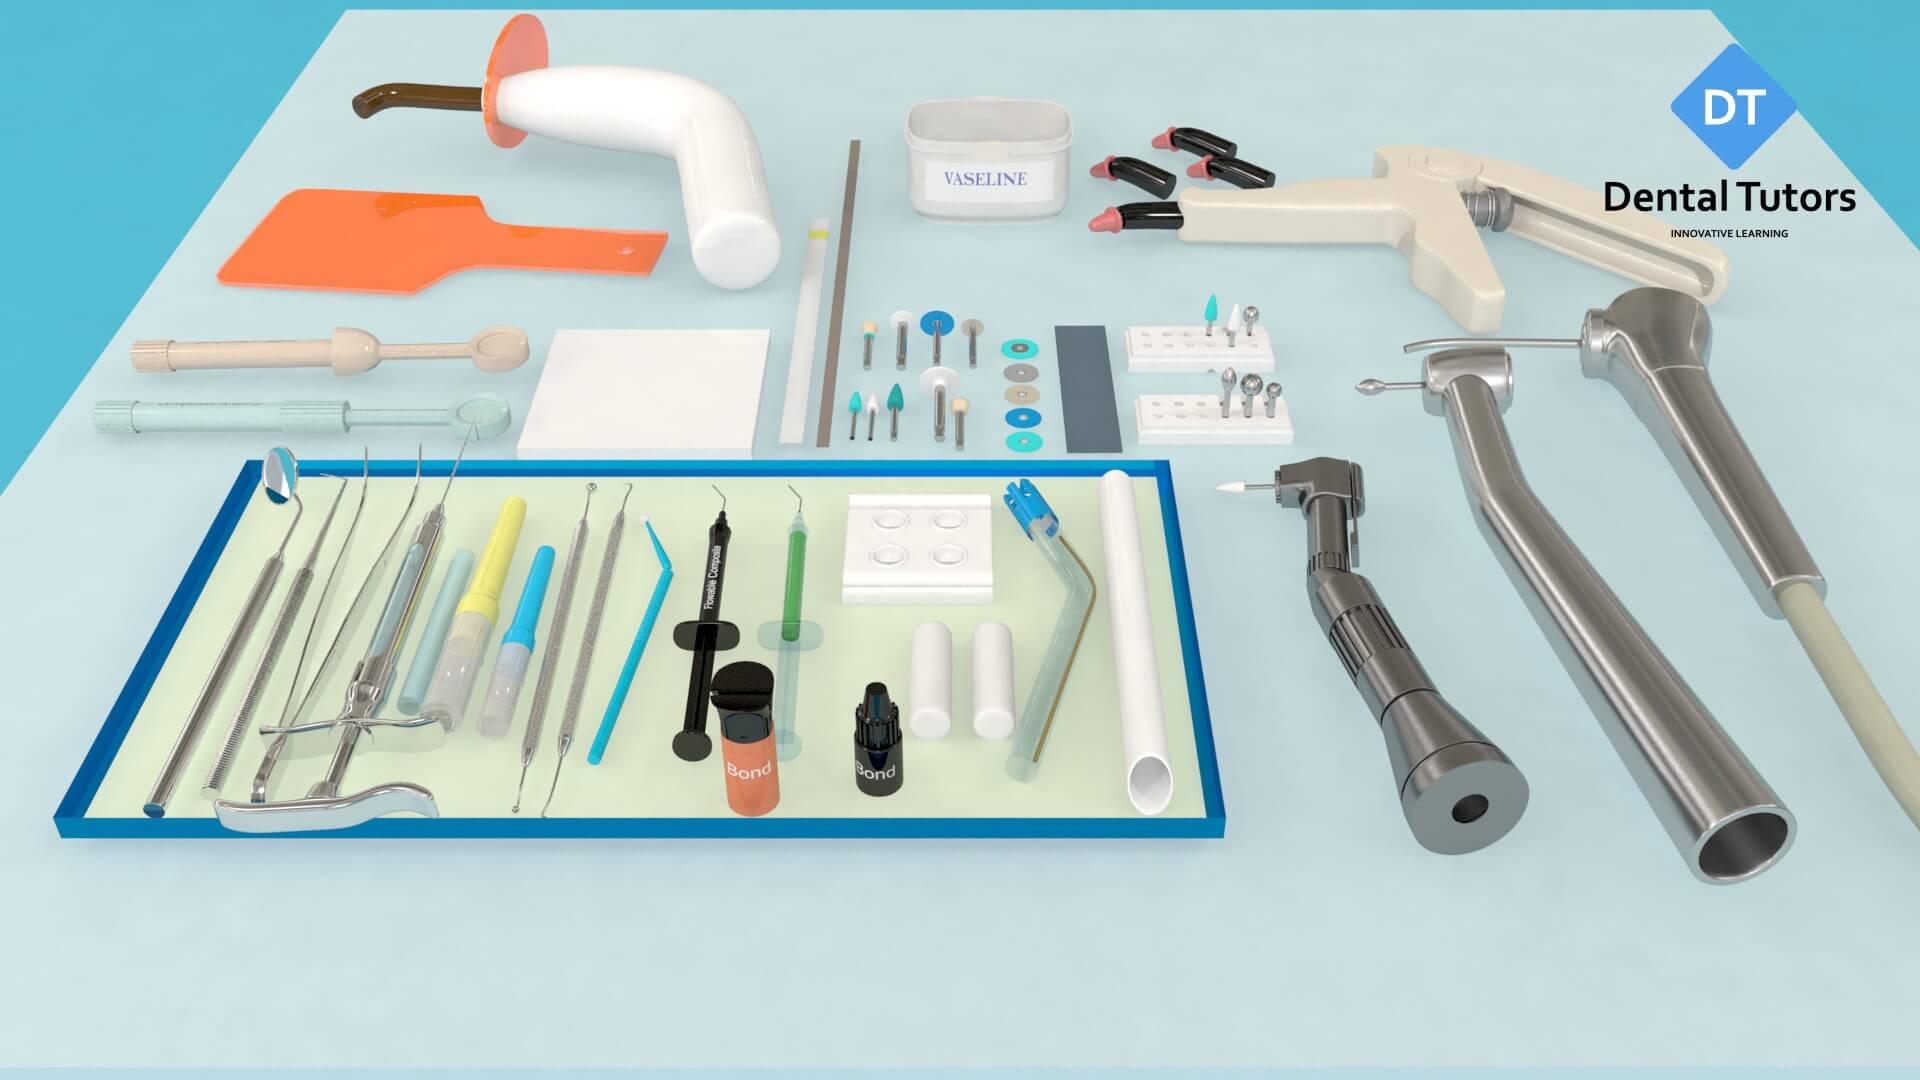 Dental composite treatment instruments